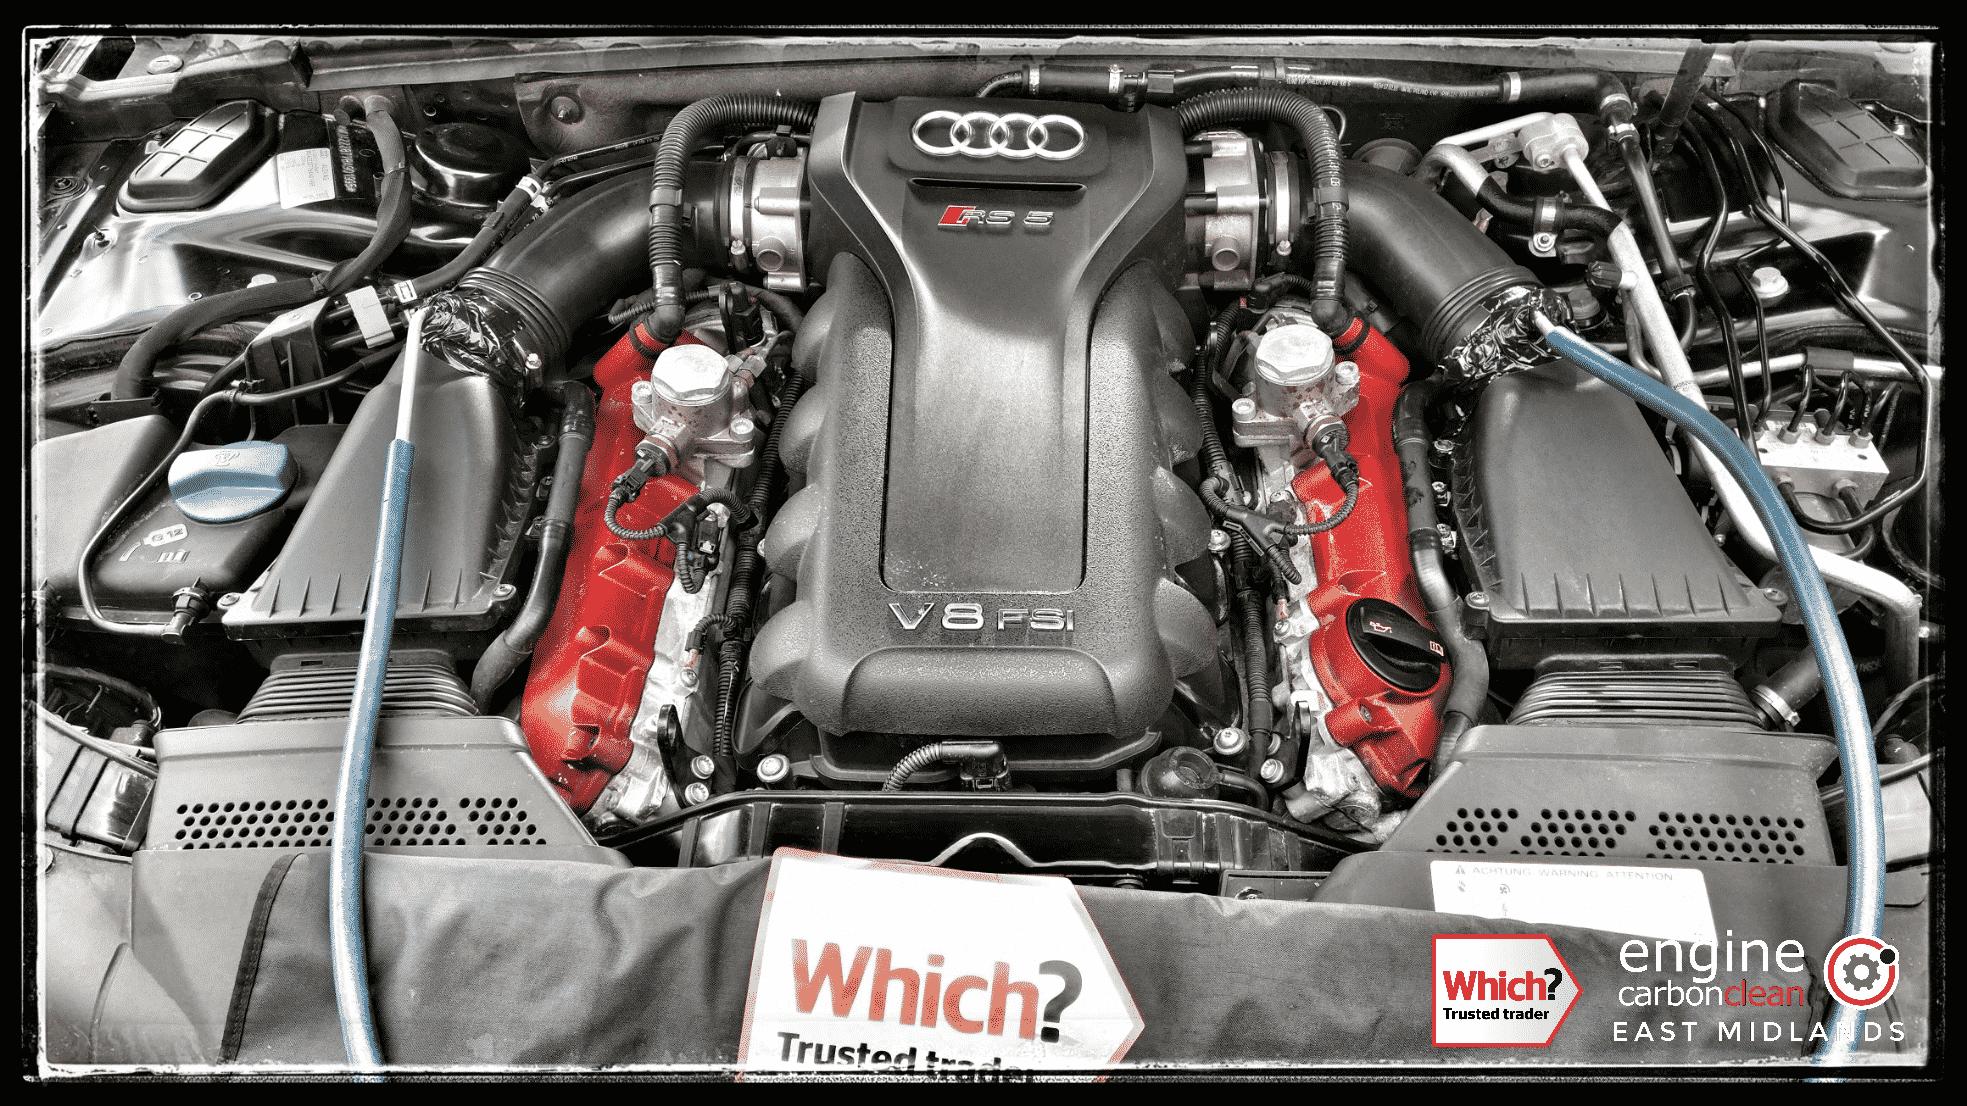 2010 Audi RS5 4.2 V8 on 25.965 miles